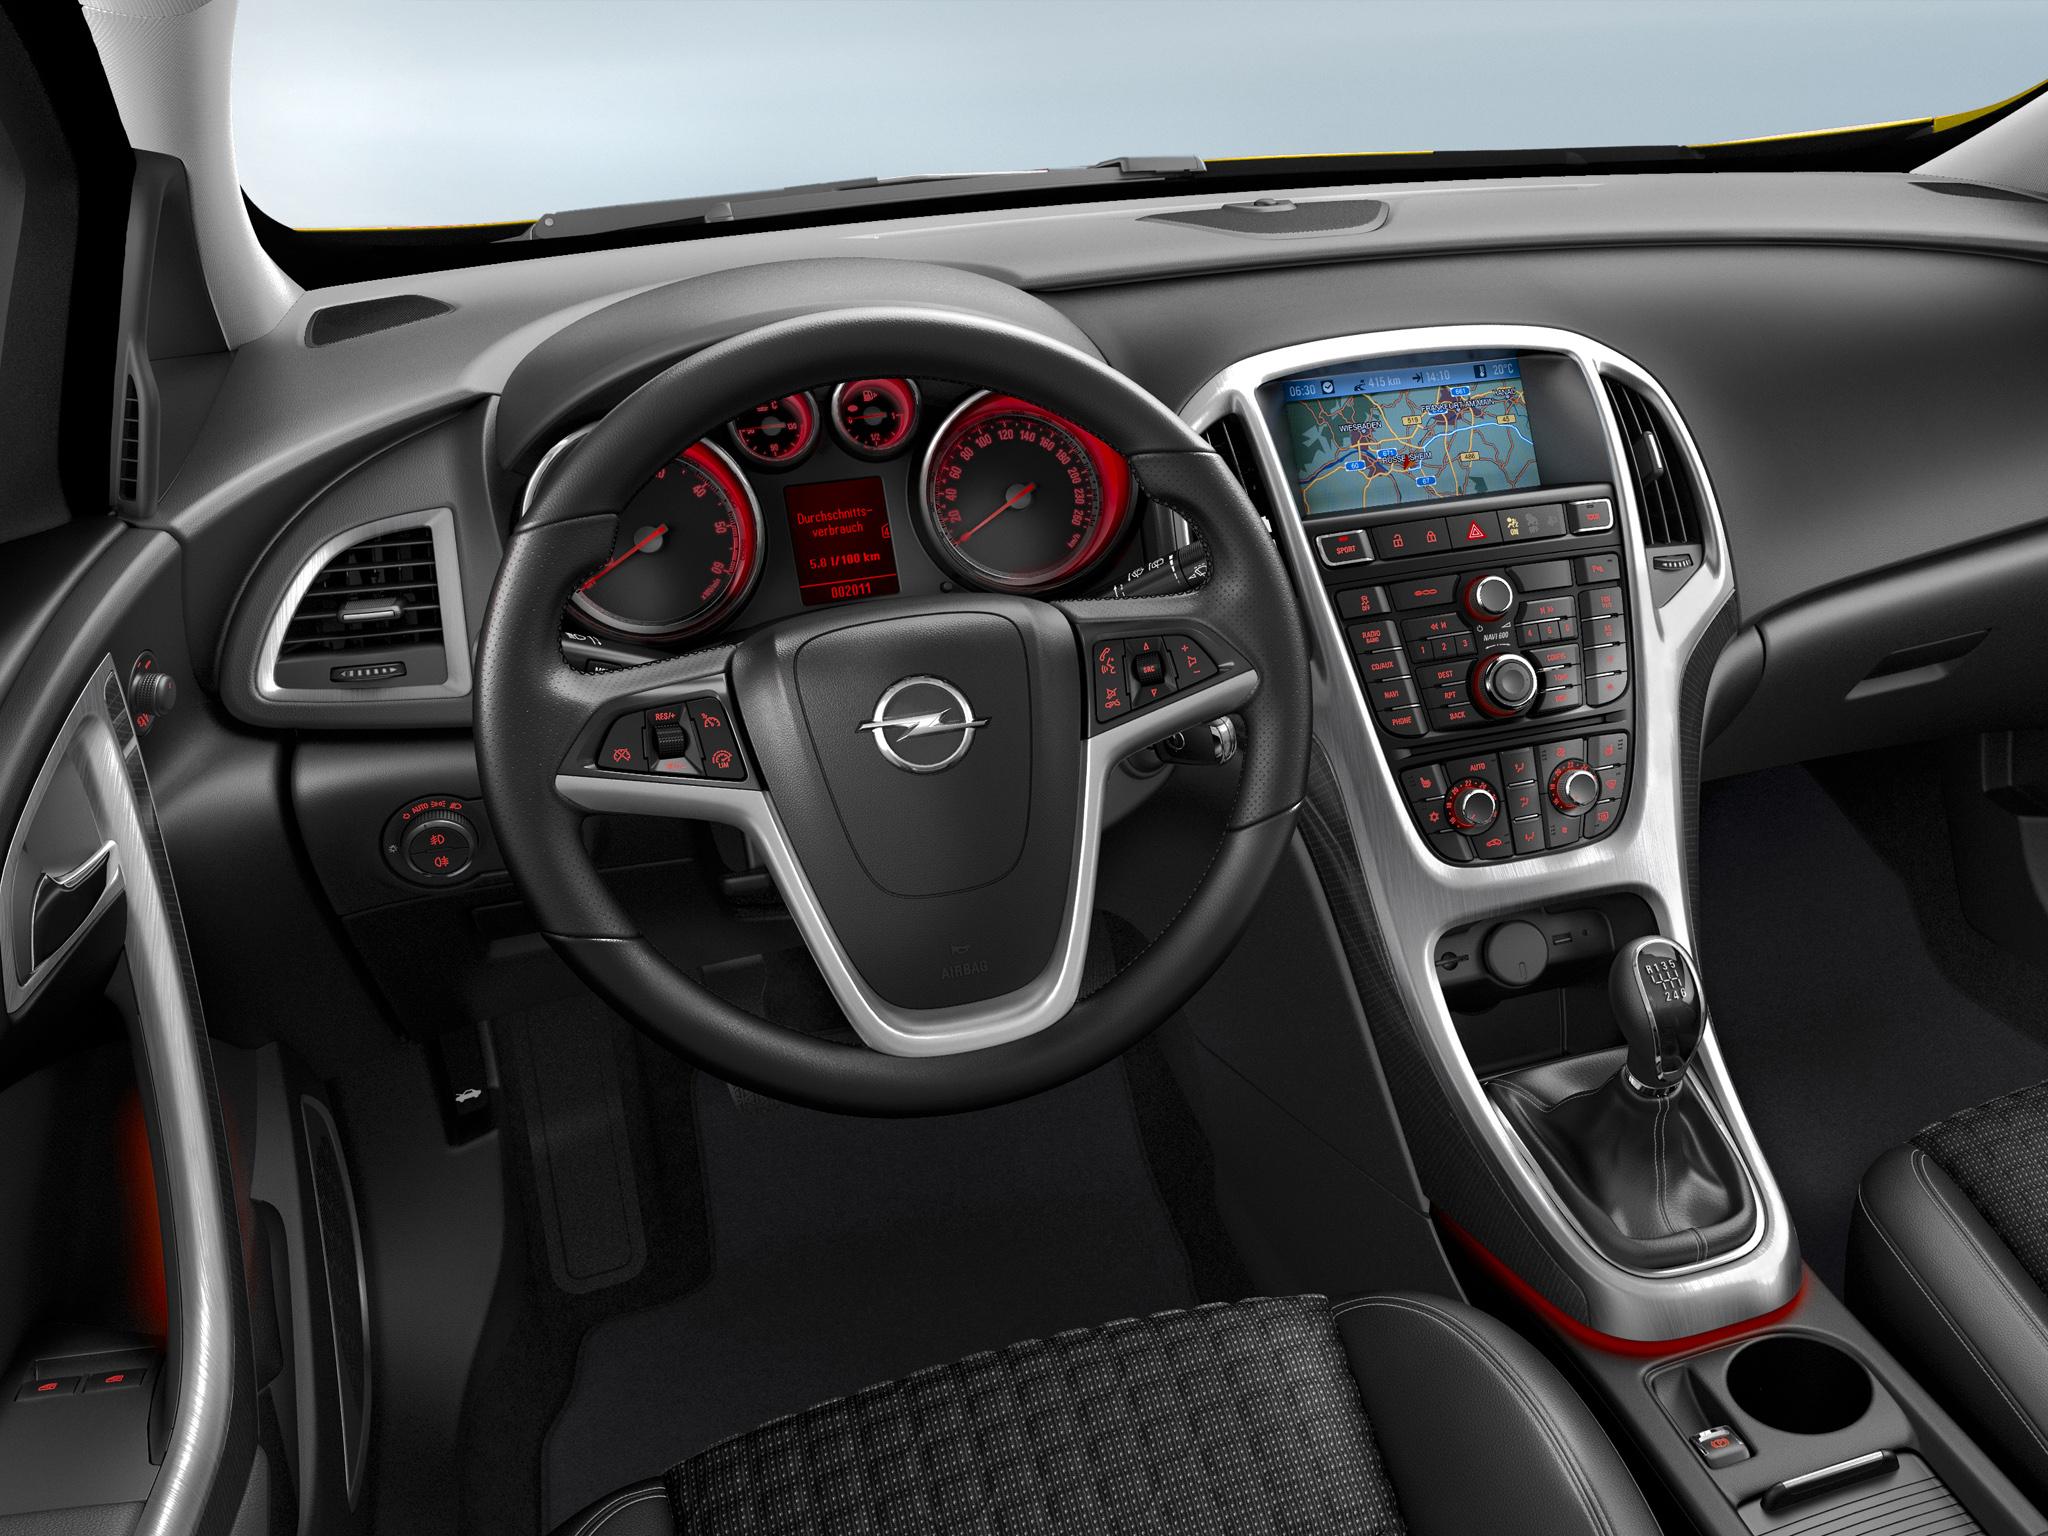 2017 - [Hyundai] I30 - Page 2 Opel_astra_gtc_j_hatchback3d-4915